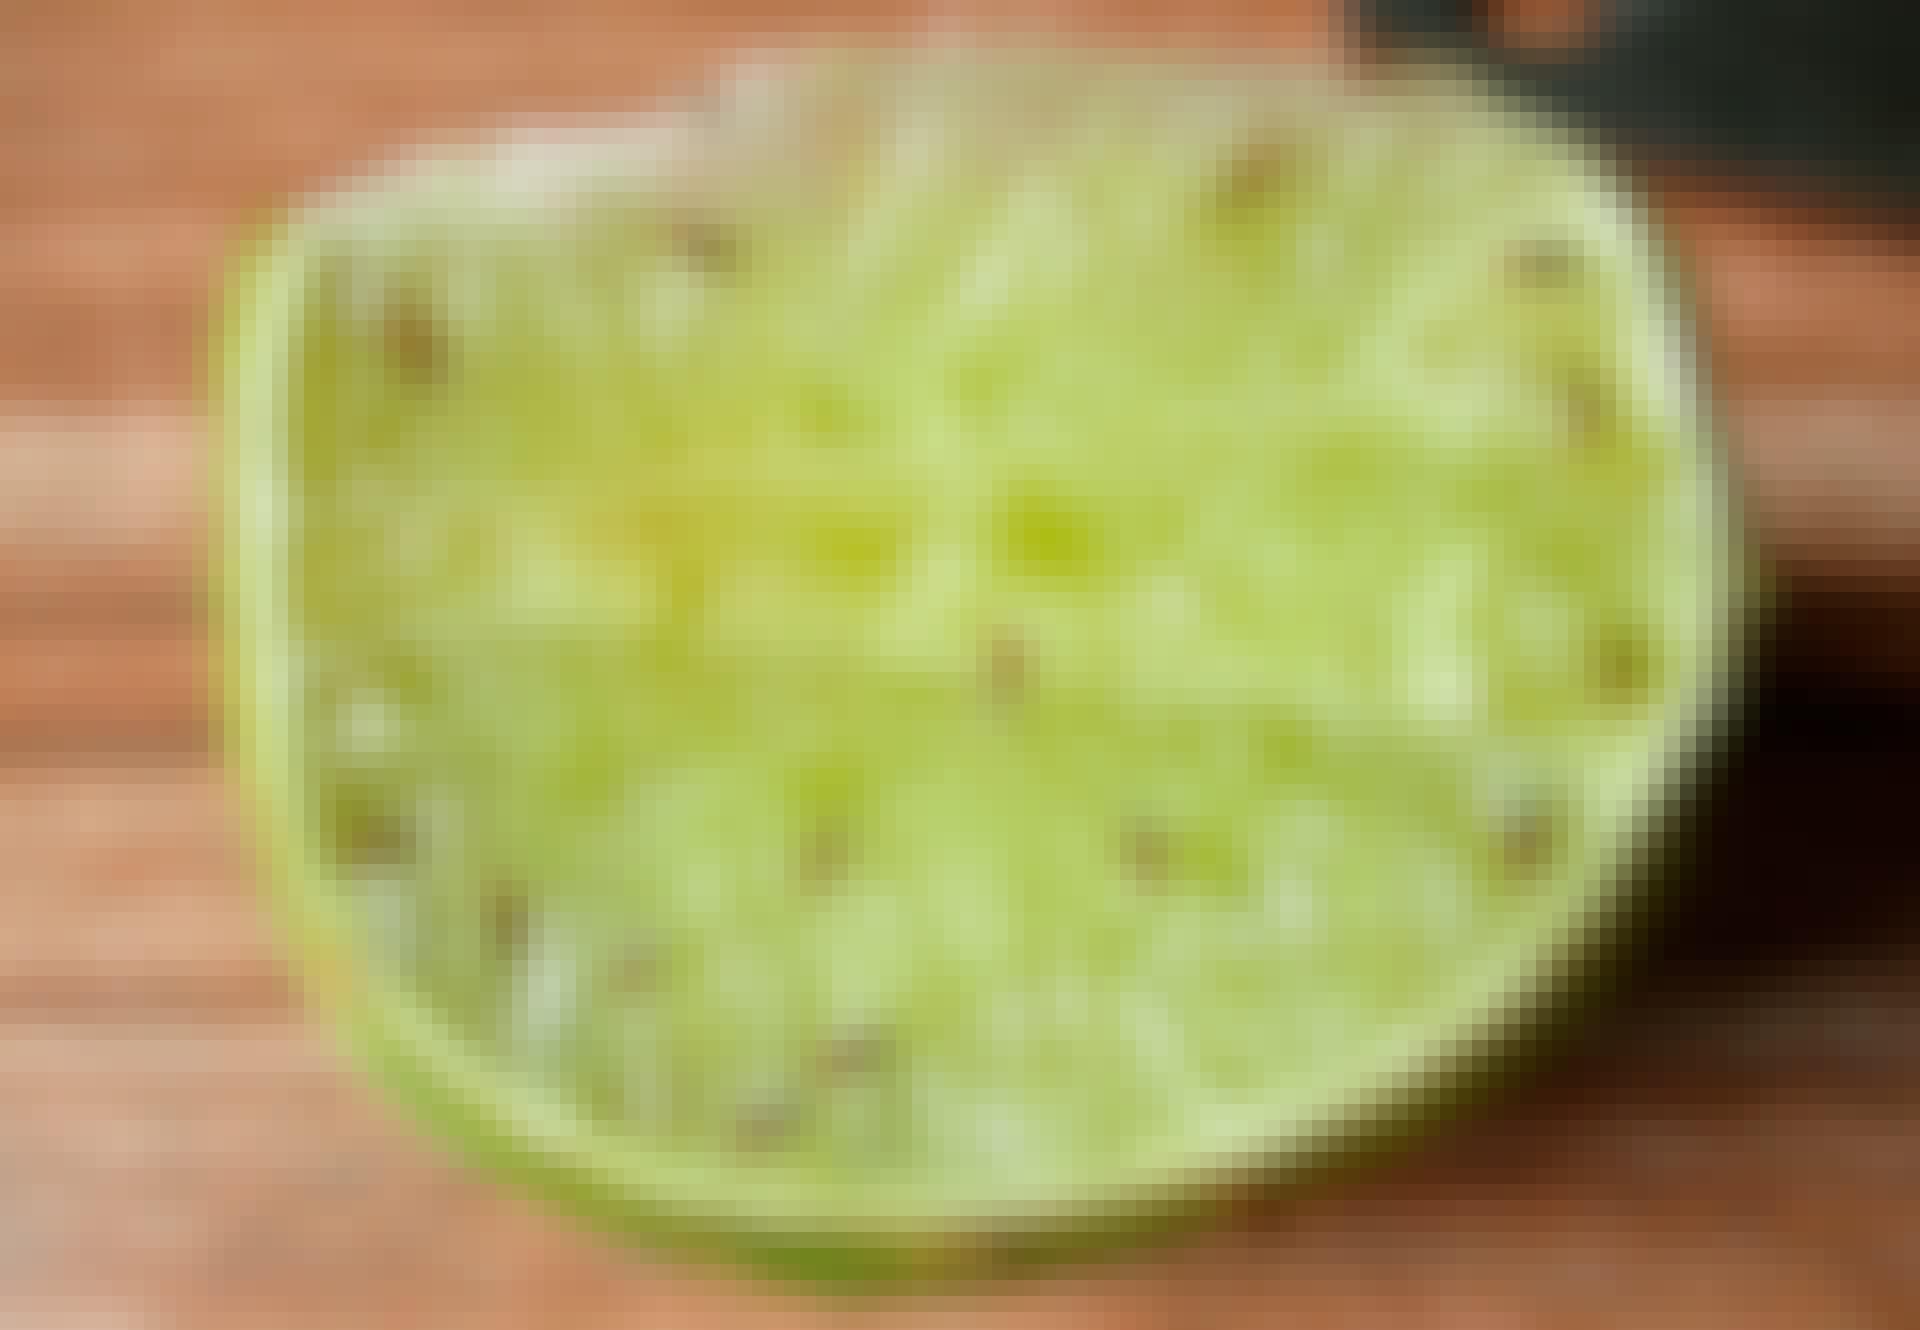 Fruitvliegjes op fruit